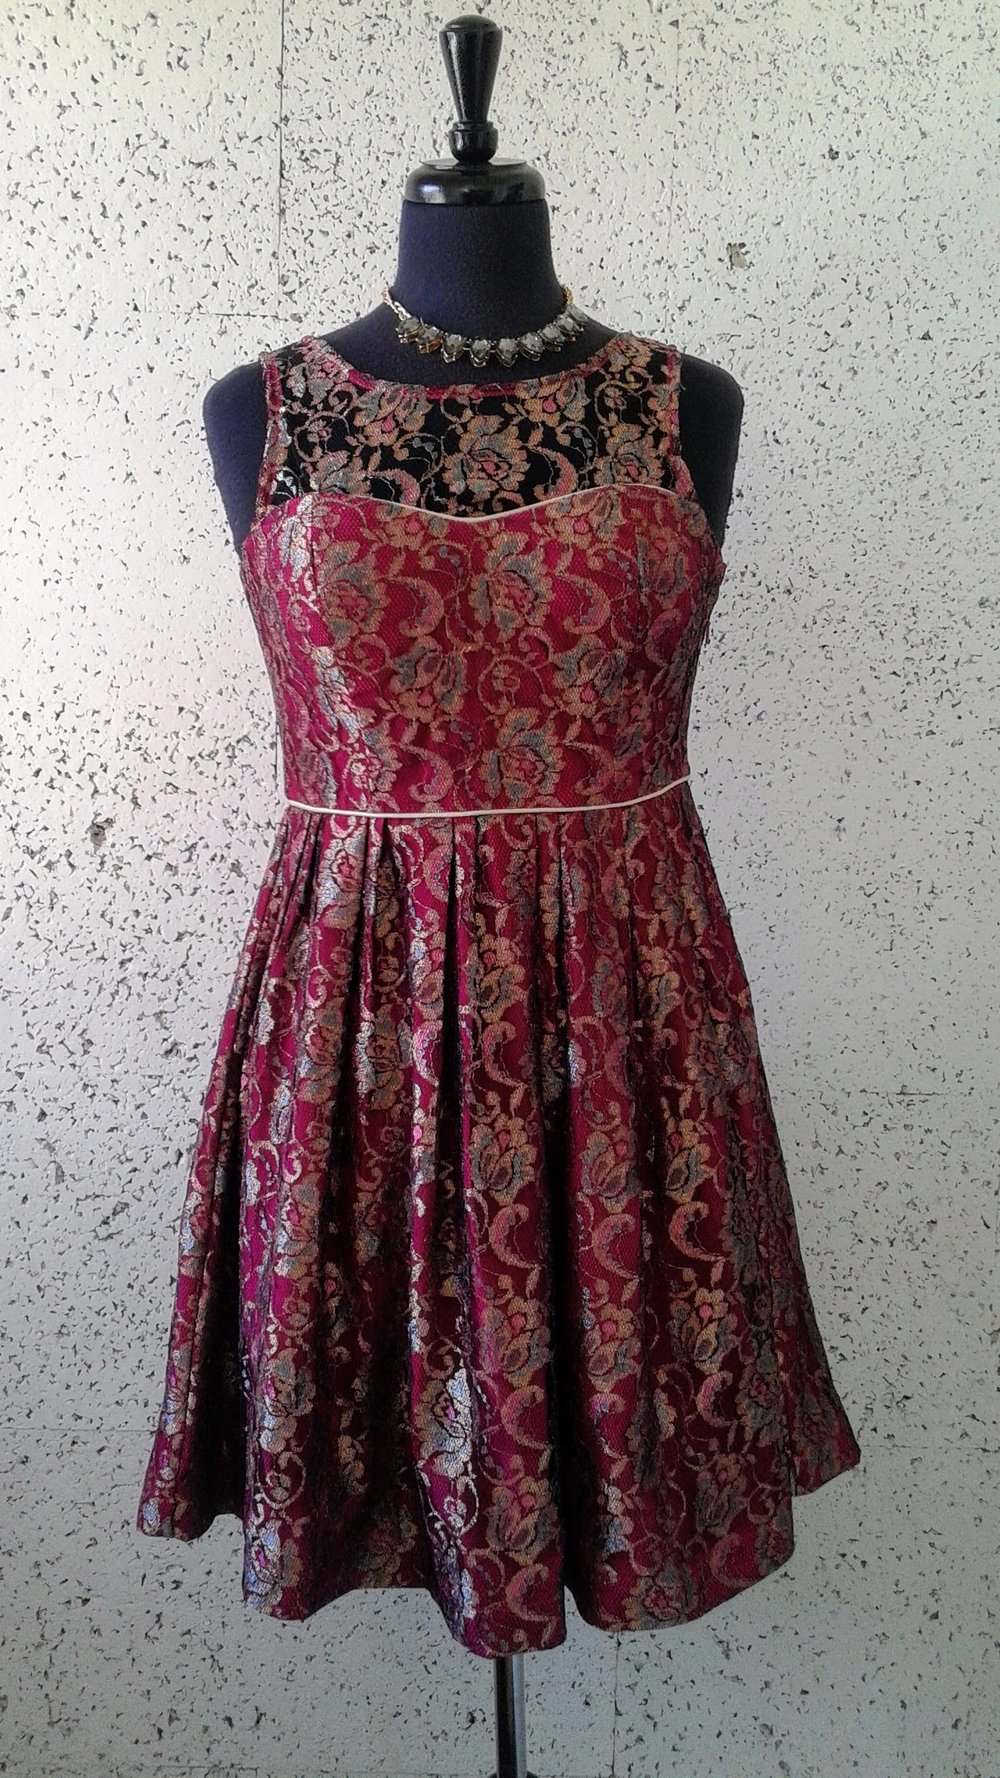 Minuet dress (NWT); Size M, $42